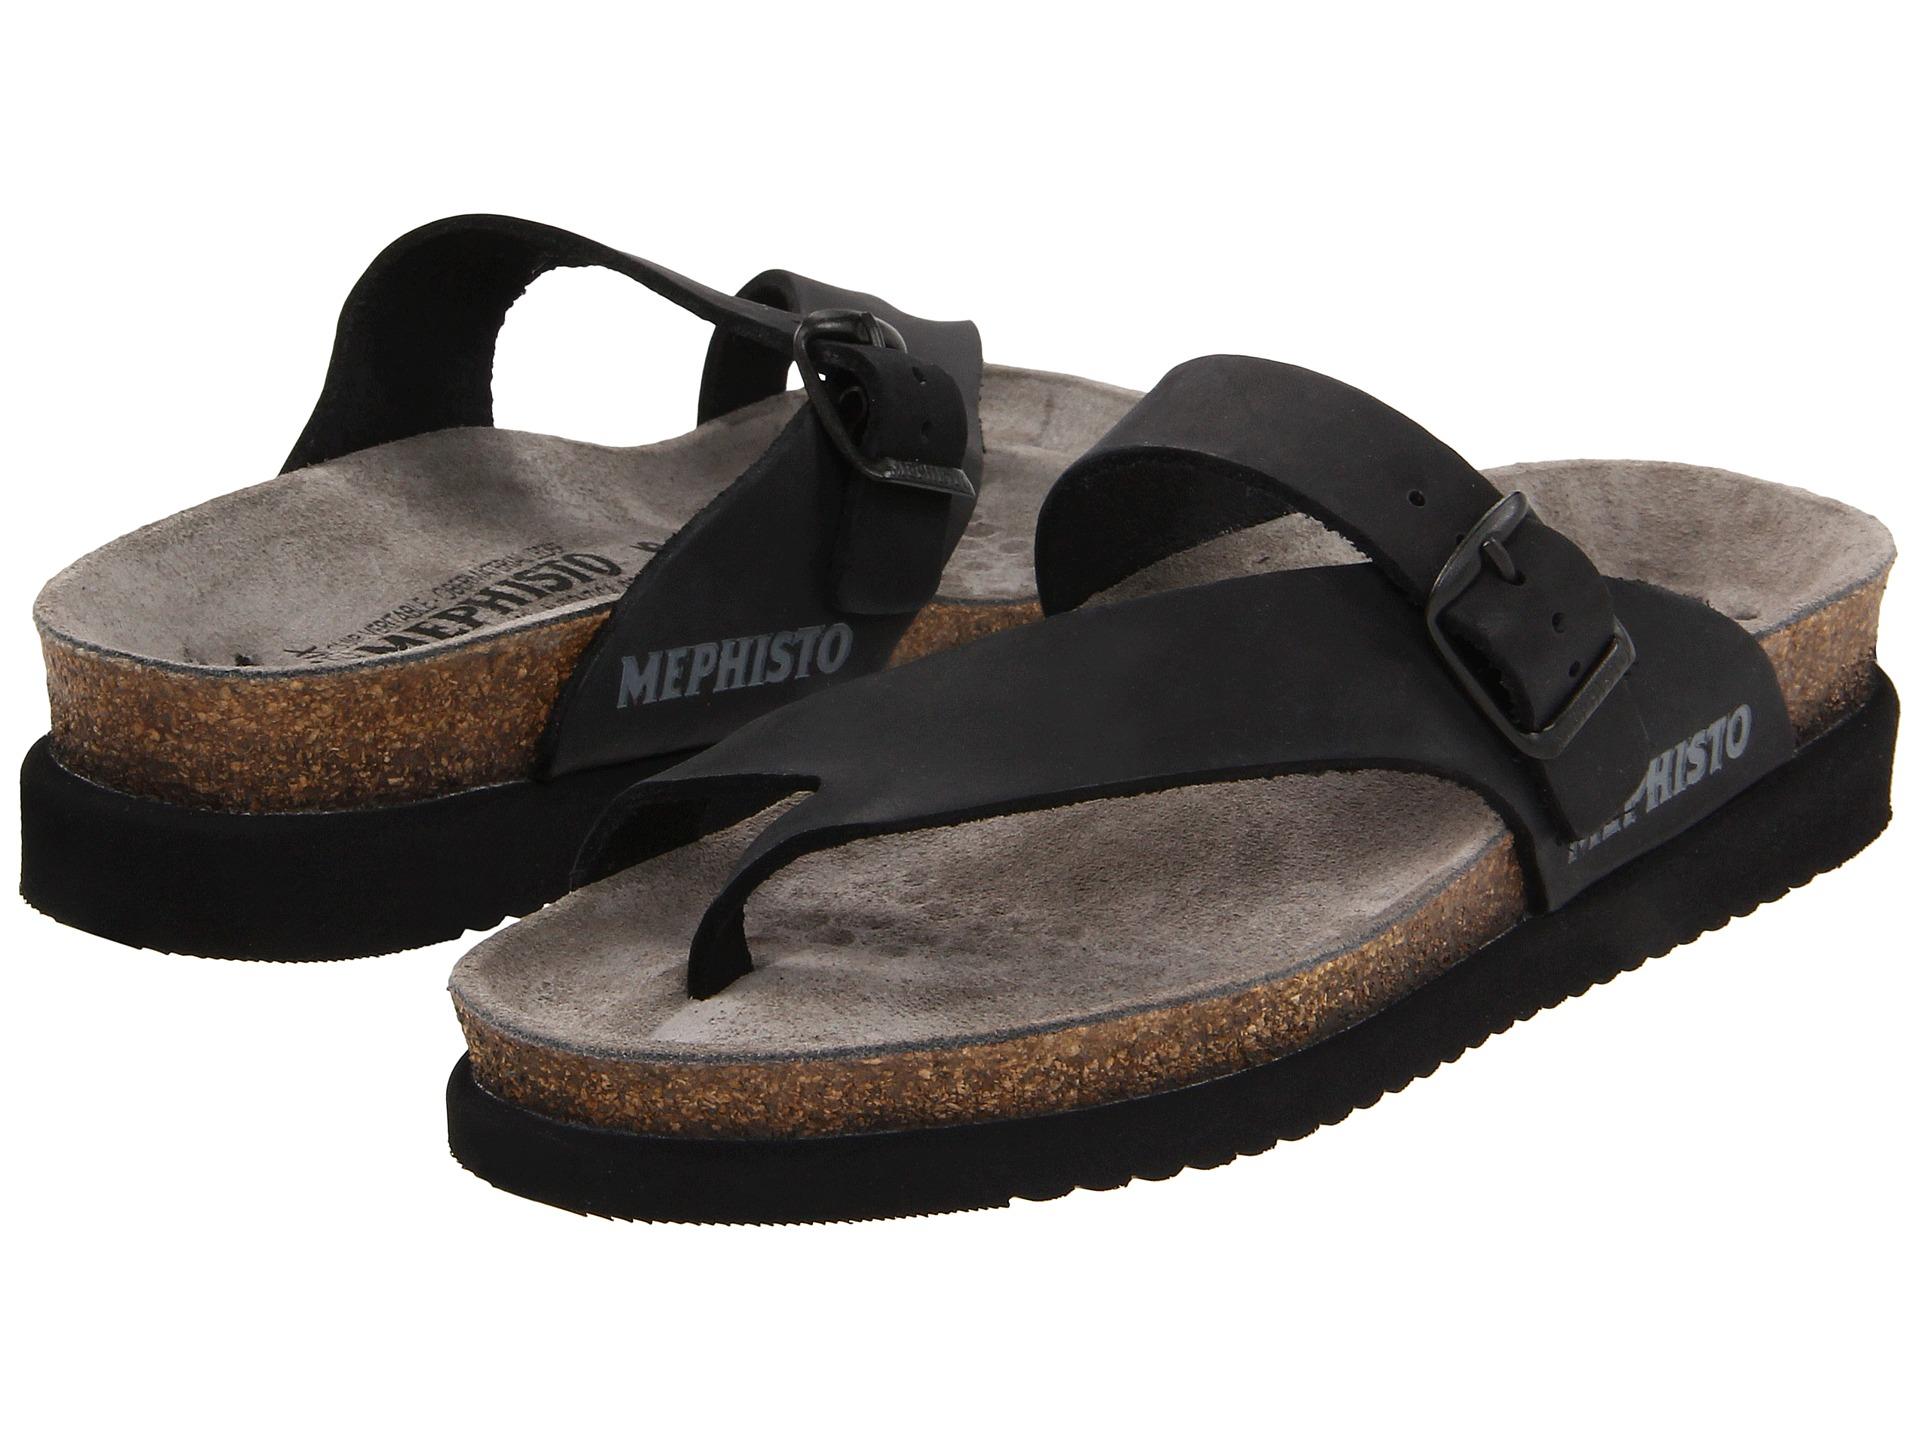 Women's sandals good for plantar fasciitis uk - Women's Sandals Good For Plantar Fasciitis Uk 33